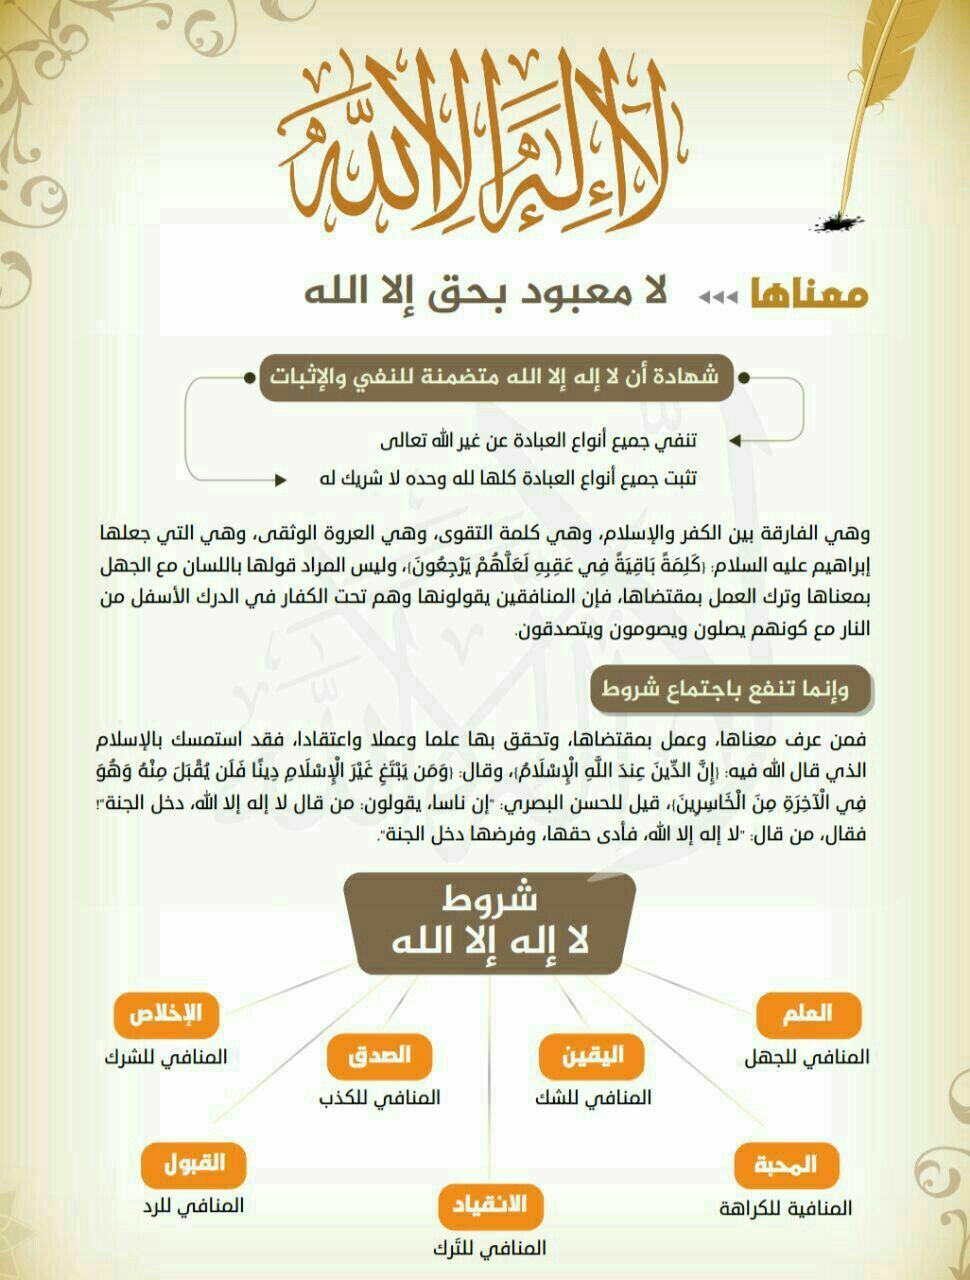 لا إله إلا الله معناها وشروطها Islamic Pictures Islam Quran Islam